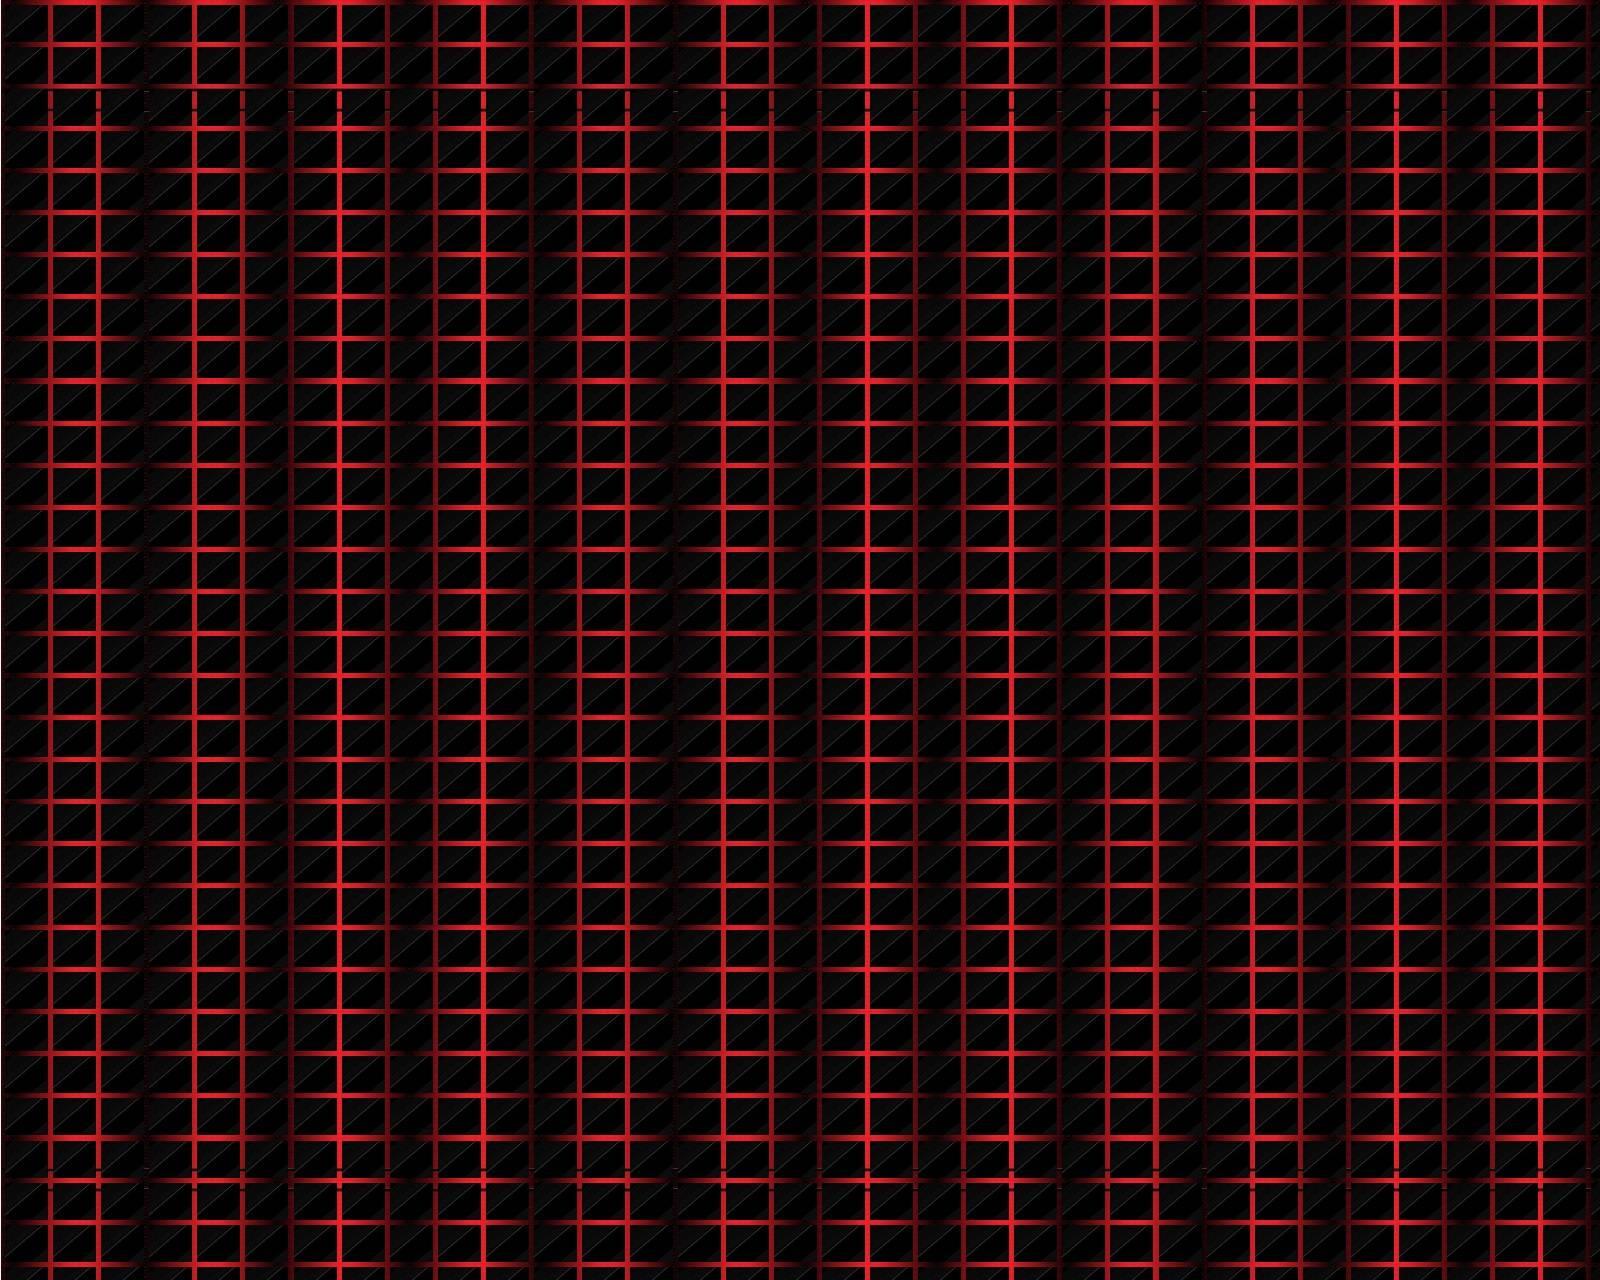 Black red mesh